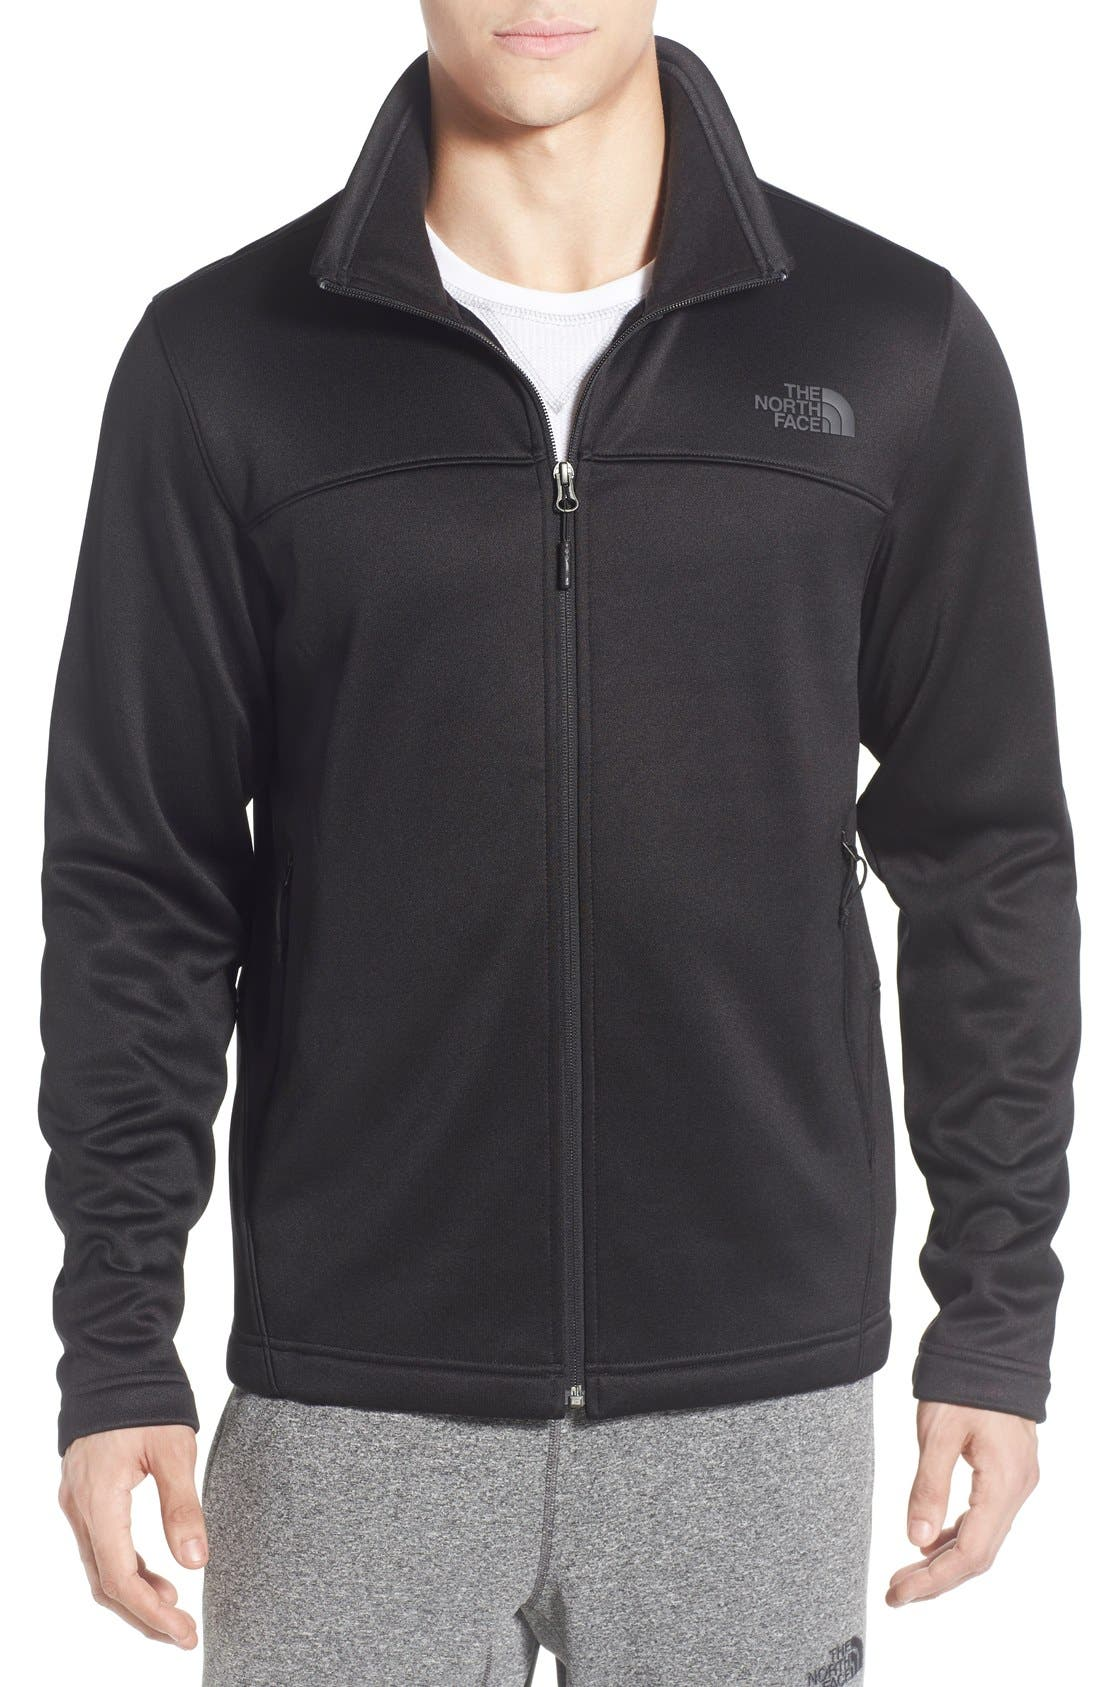 Main Image - The North Face 'Momentum' Fleece Jacket